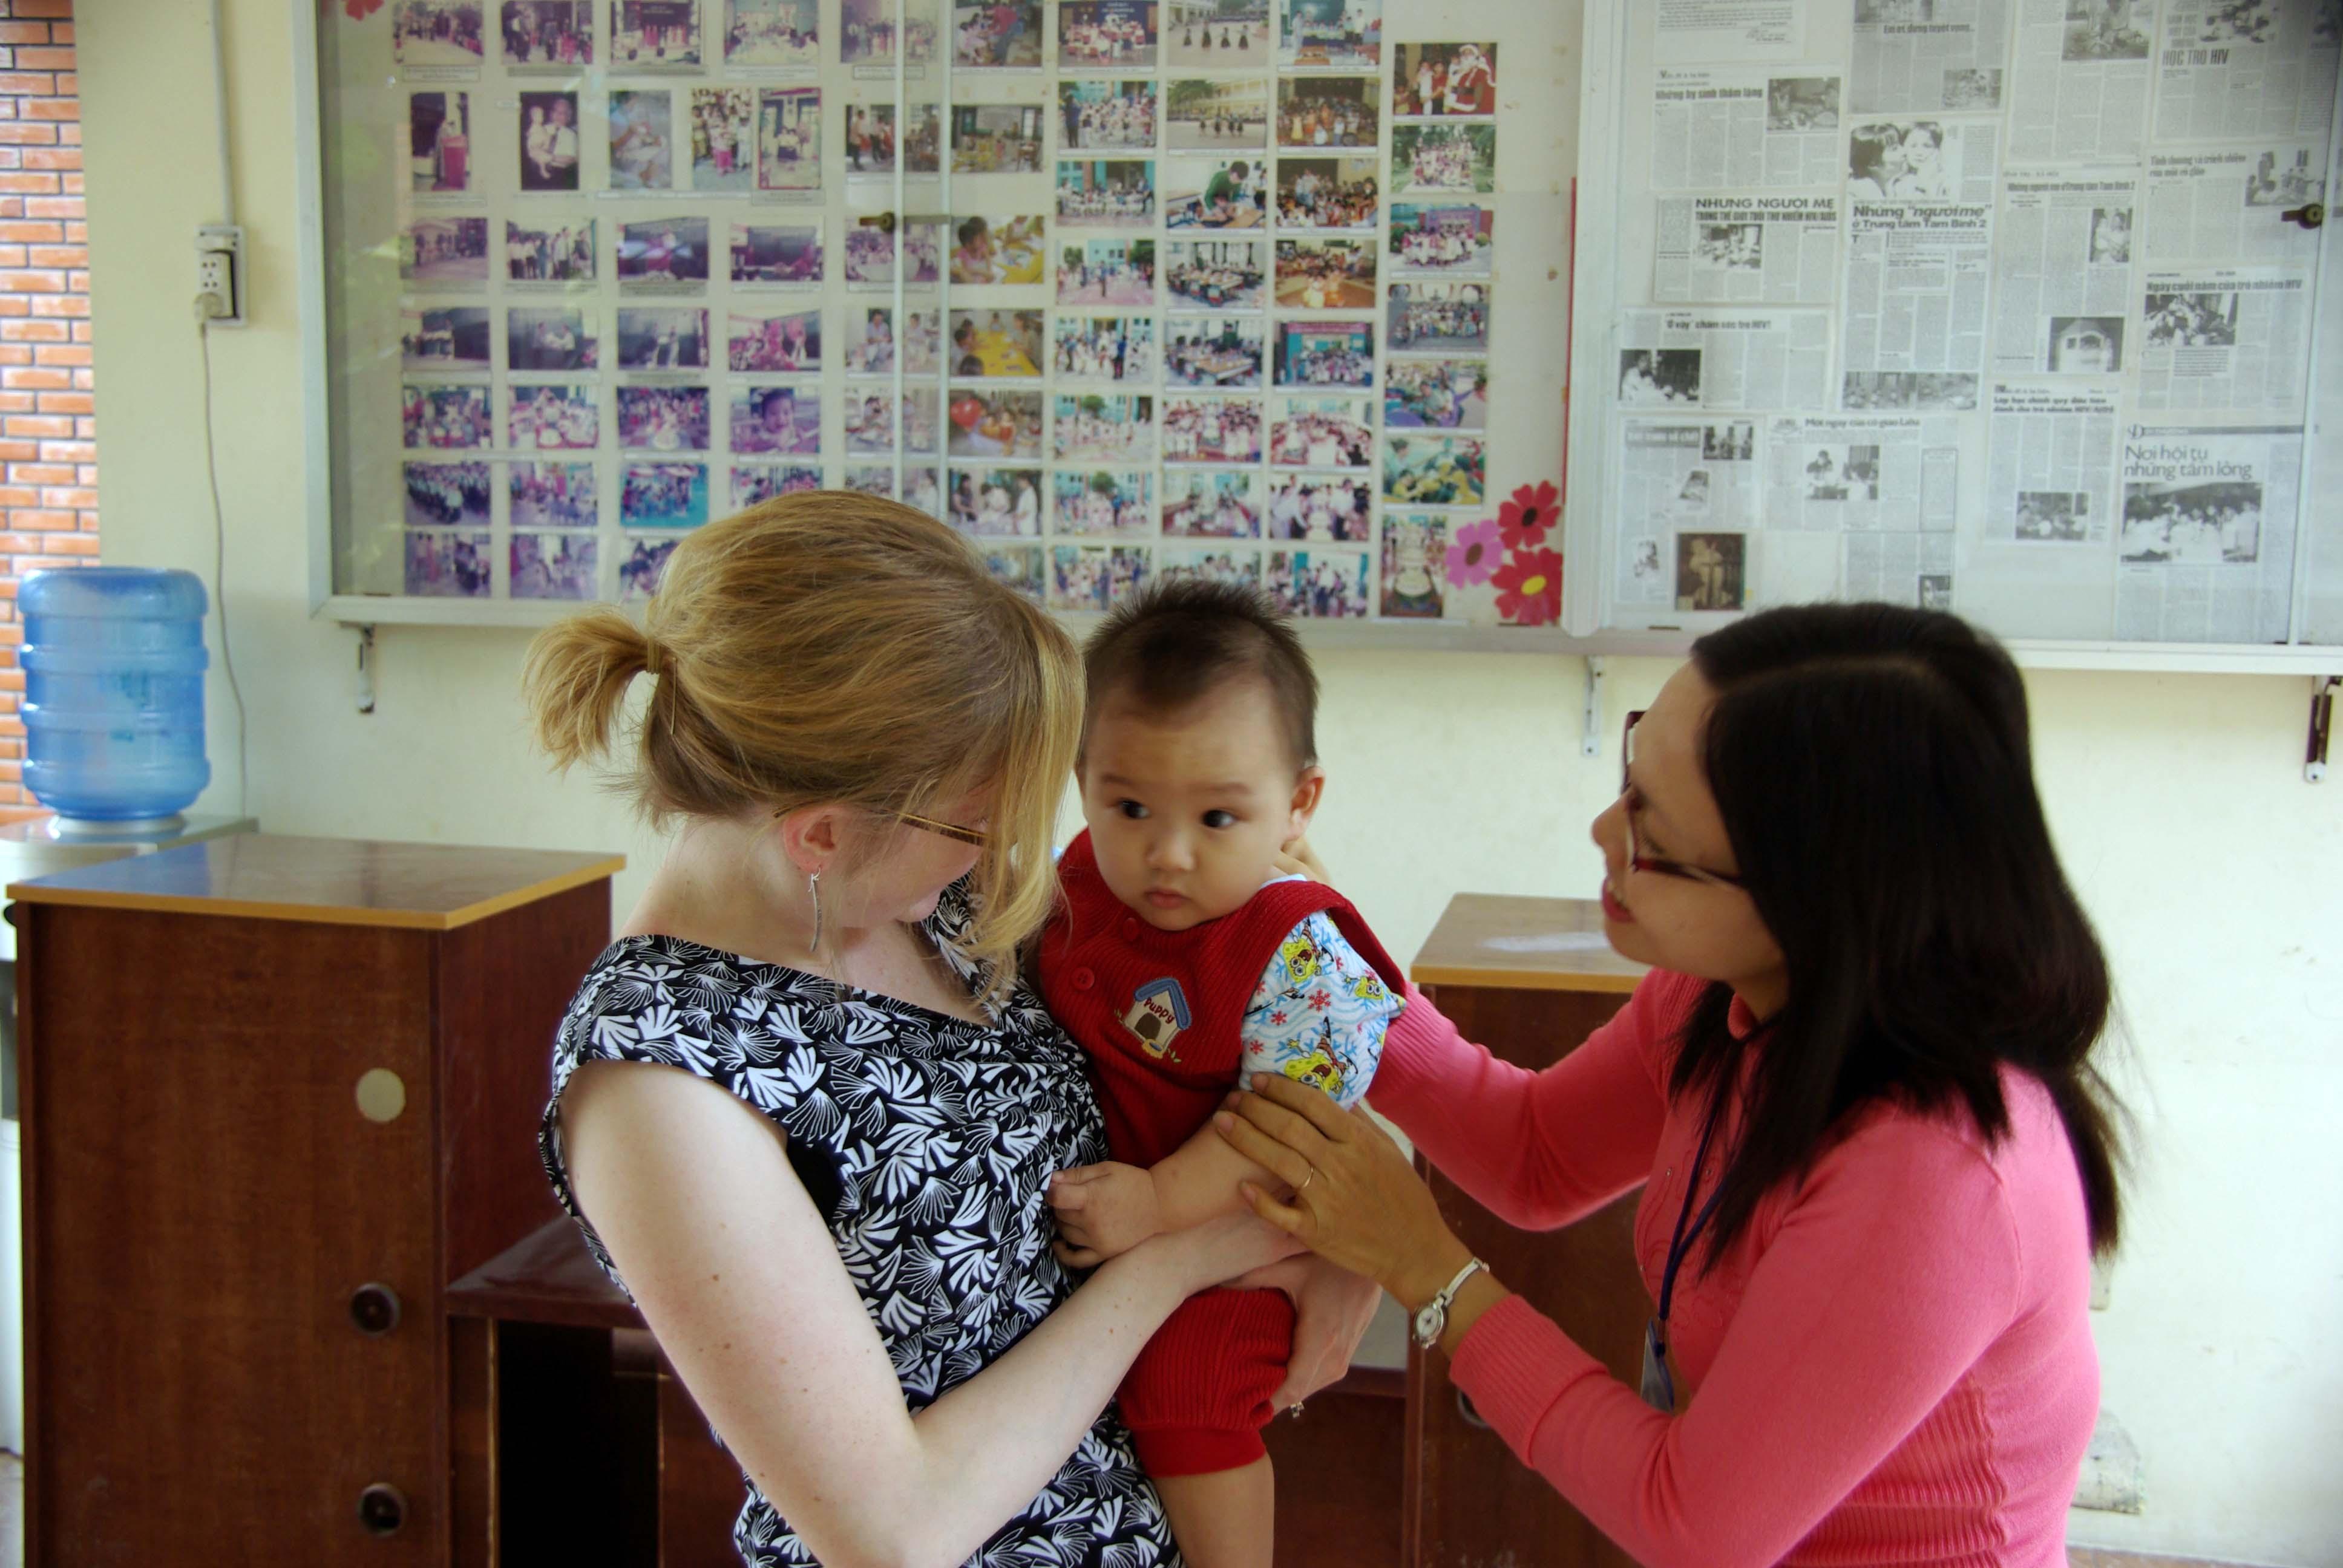 Adopting children in hong kong hk expats ccuart Gallery